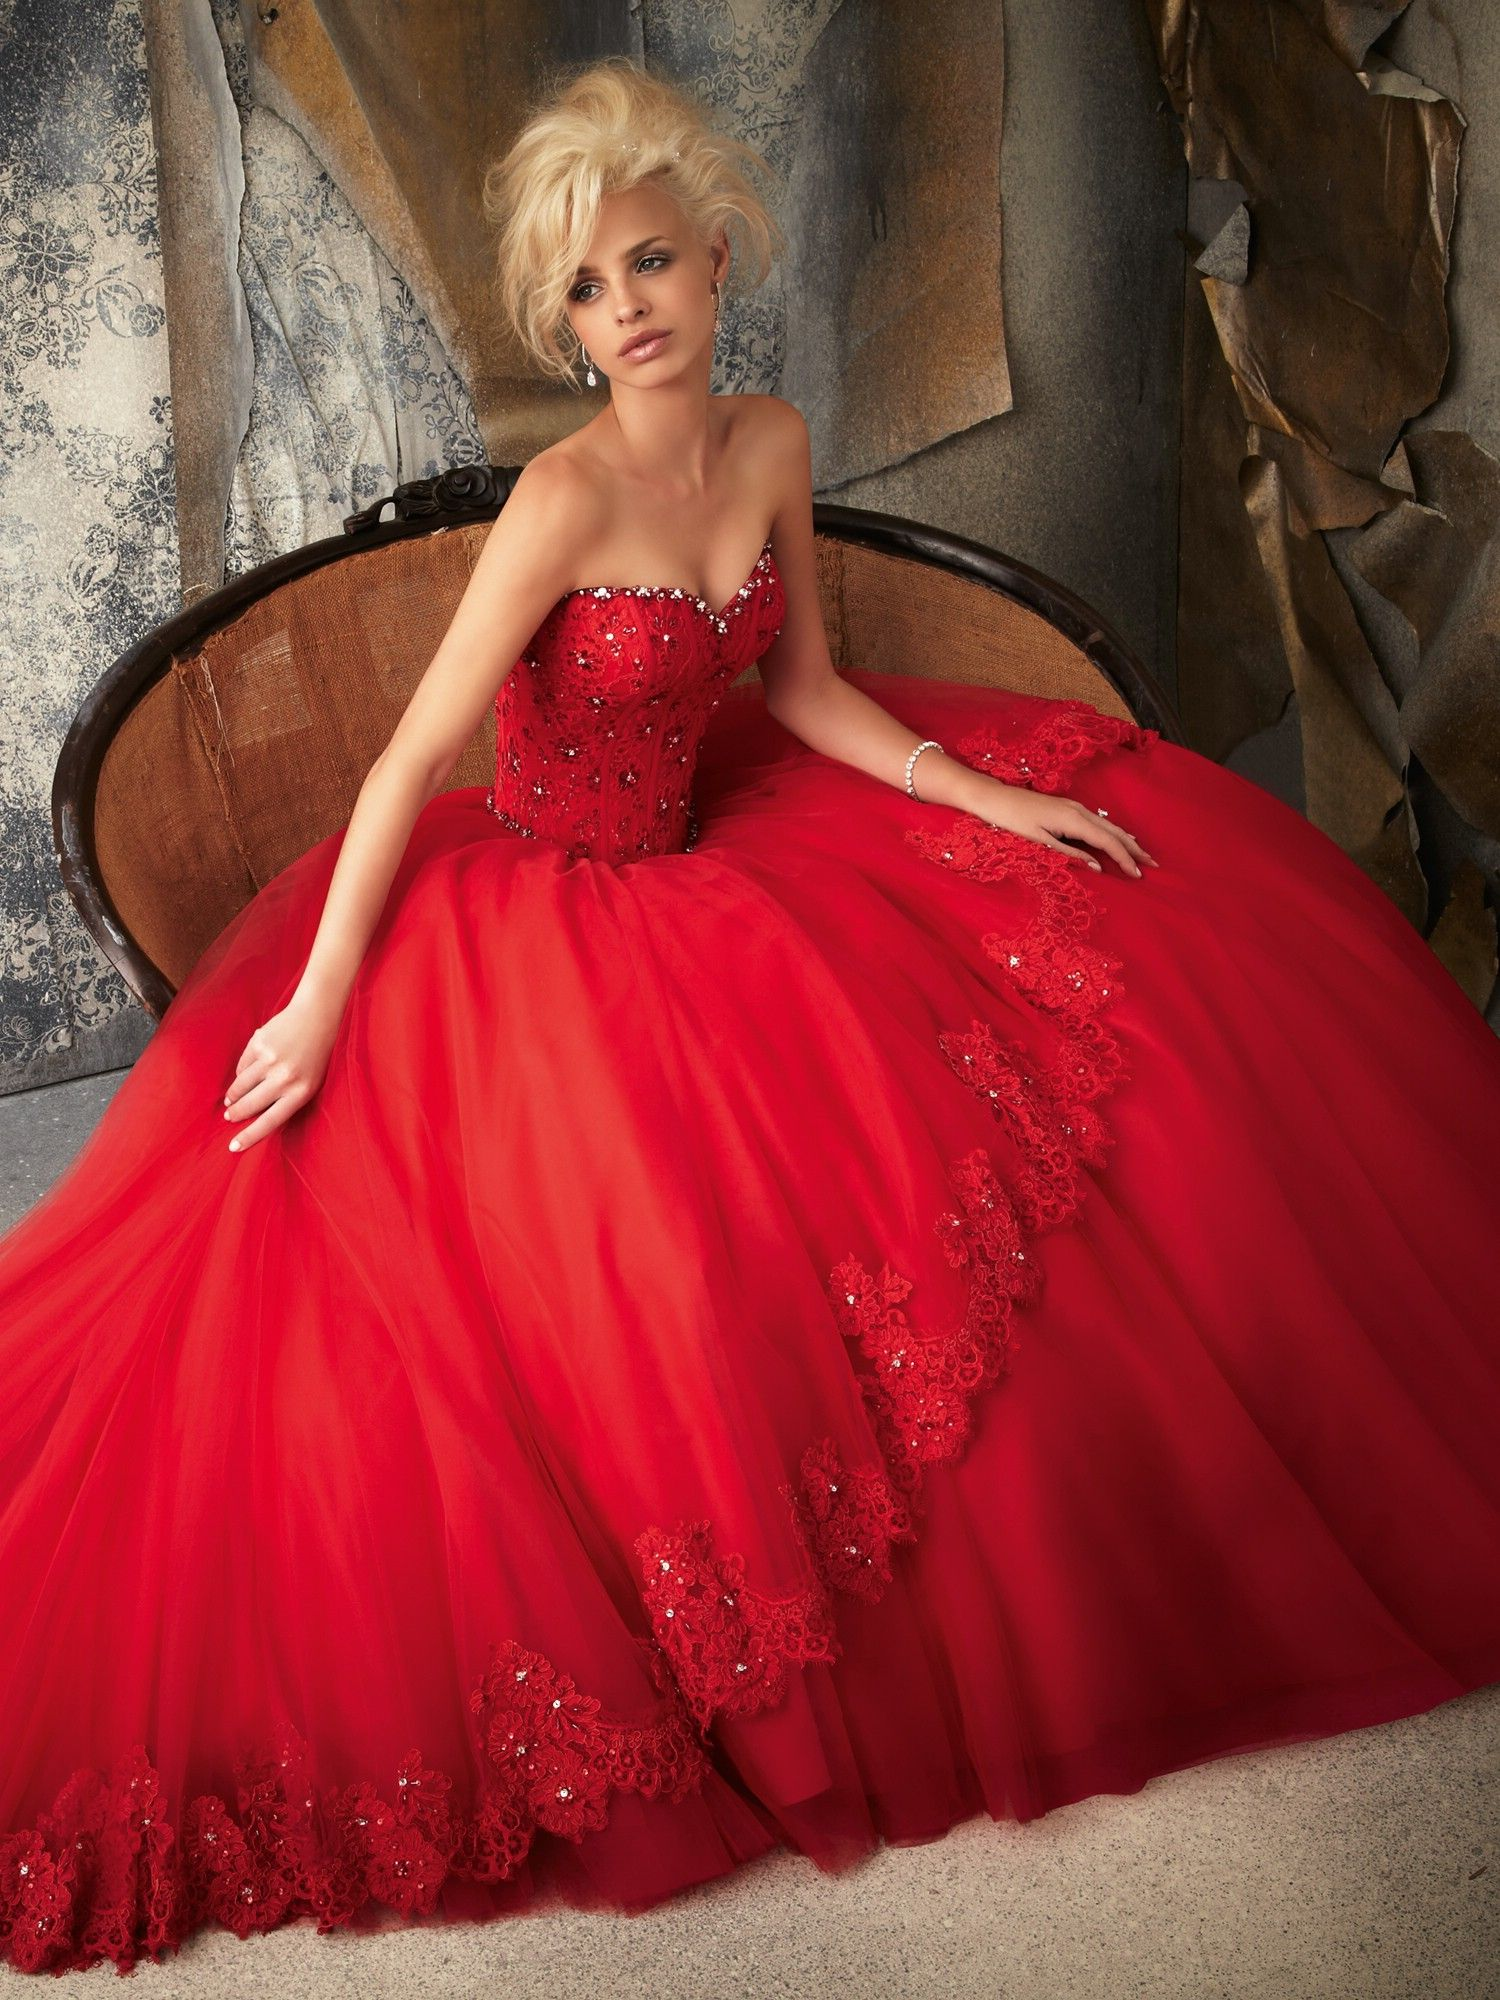 60 beautiful red wedding dress inspiration